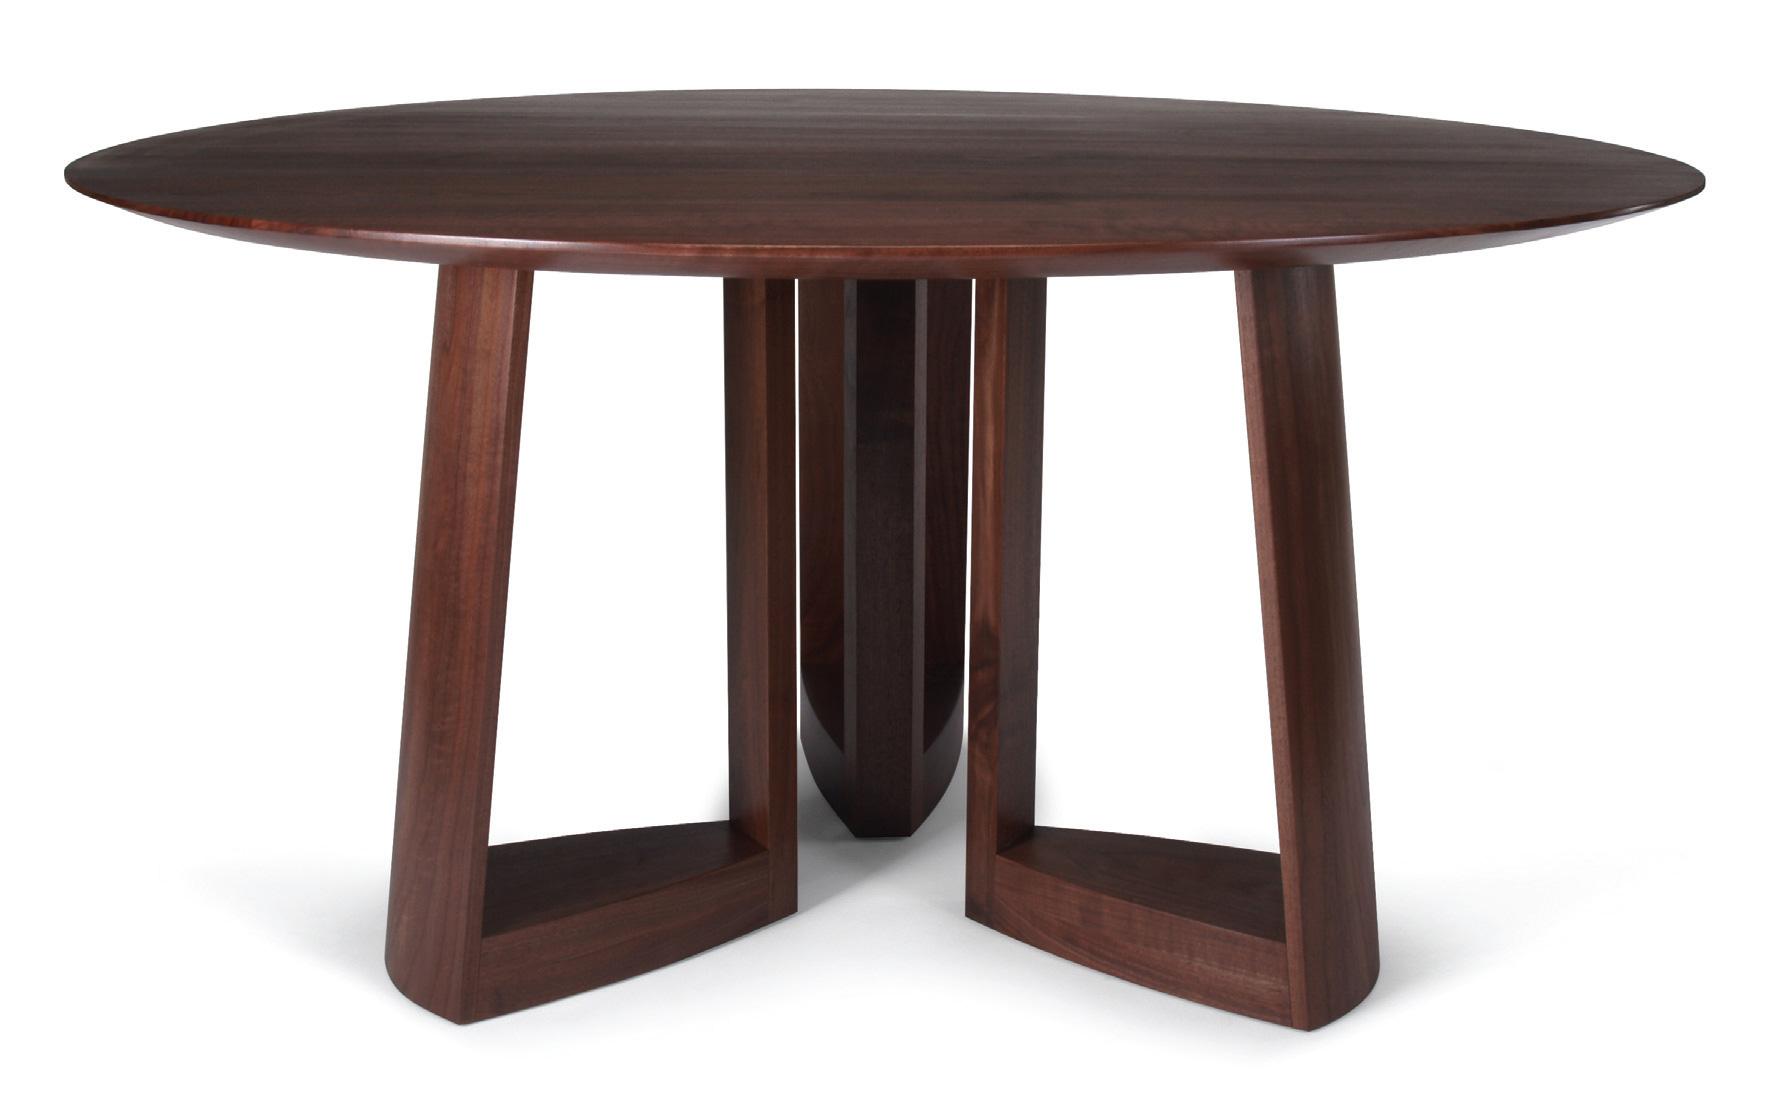 Skram Lineground Round Dining Table